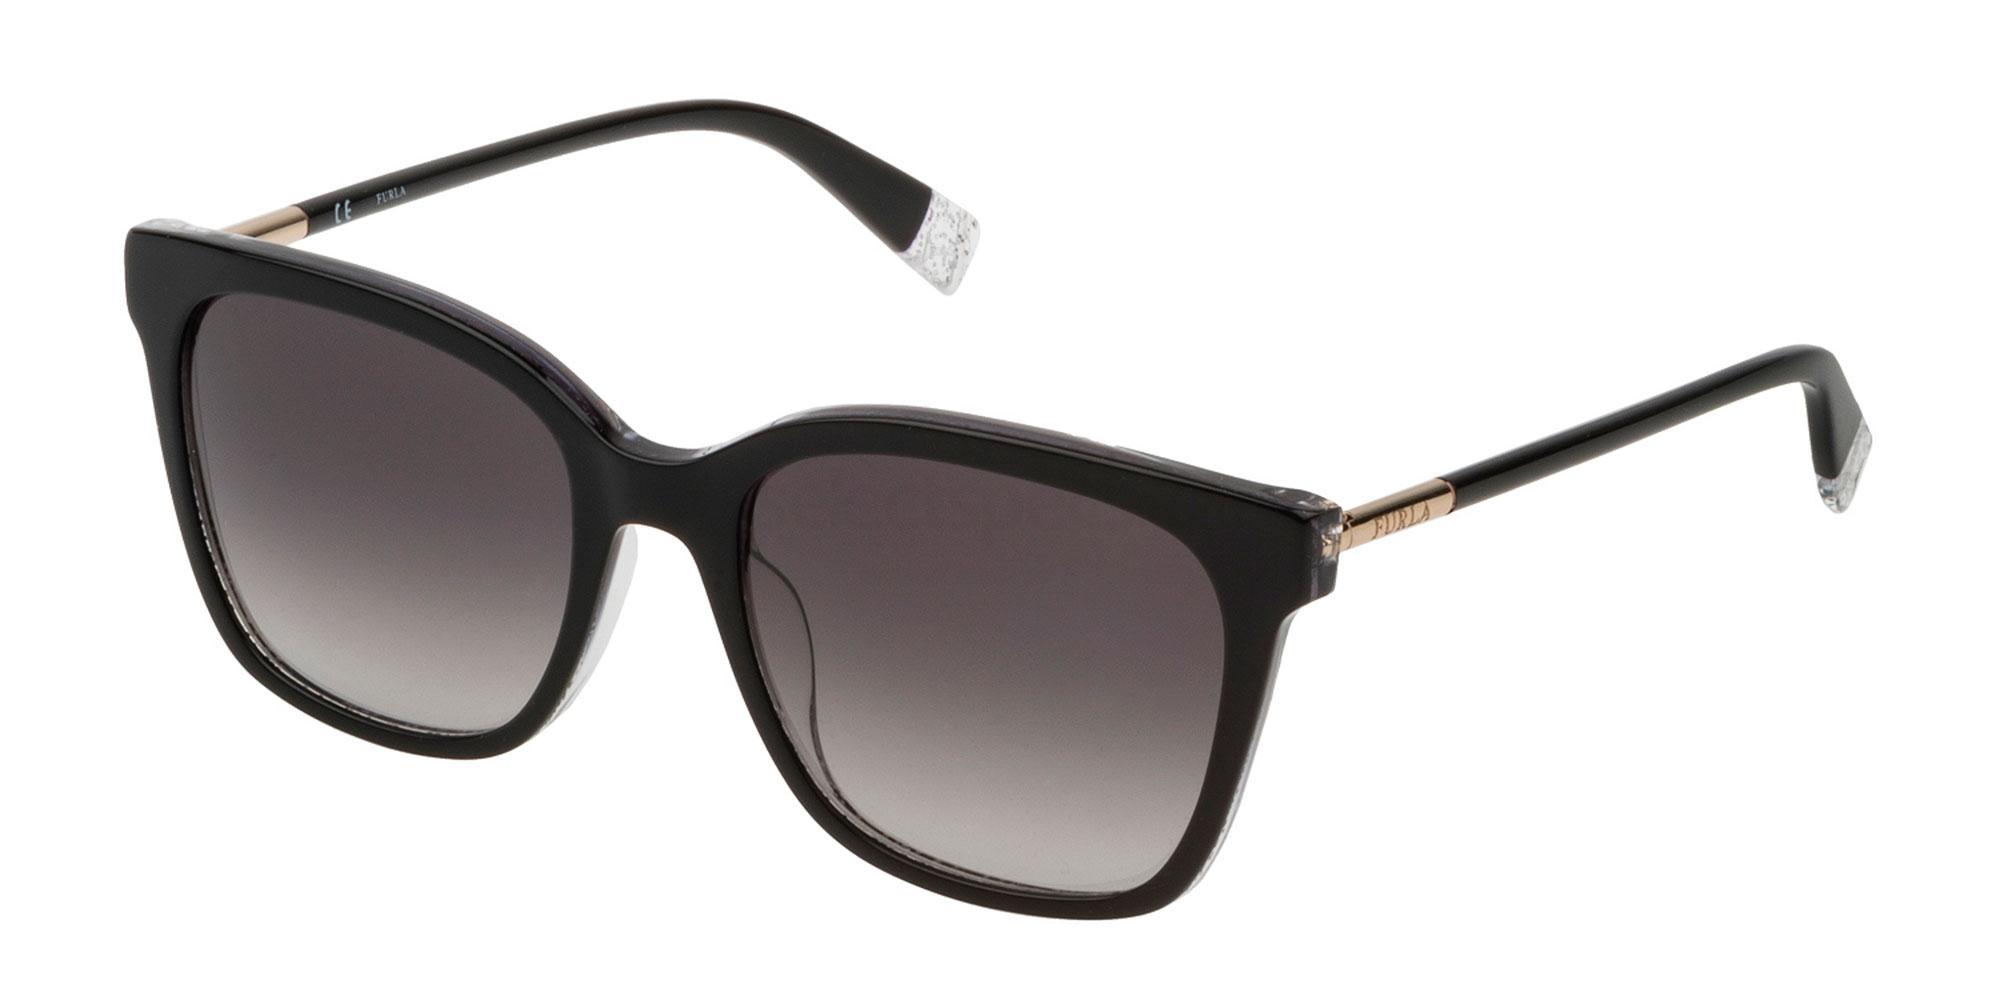 09G5 SFU233 Sunglasses, Furla